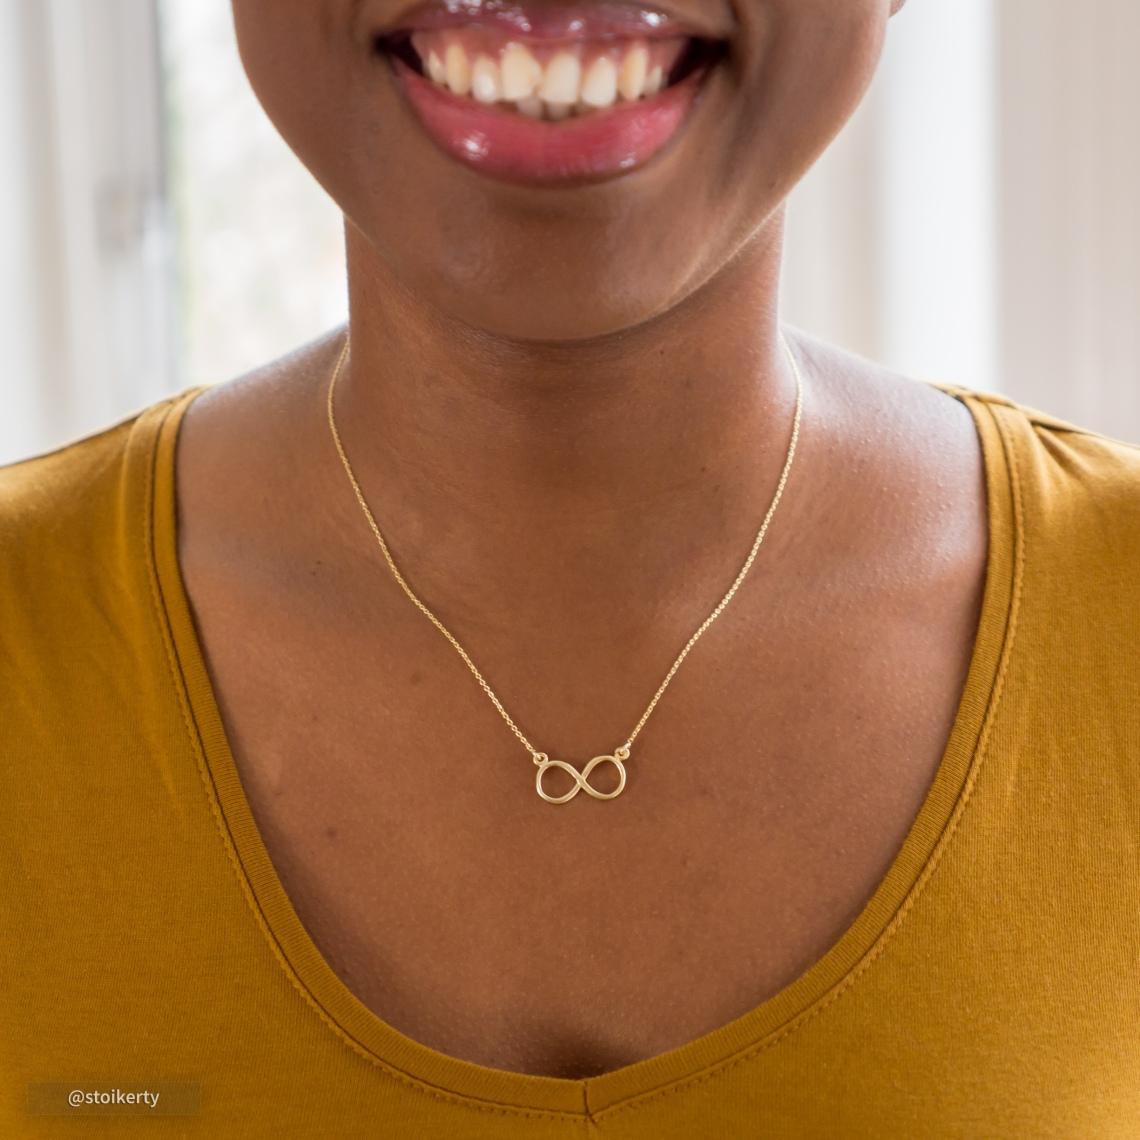 P1300184 - Dainty Jewellery